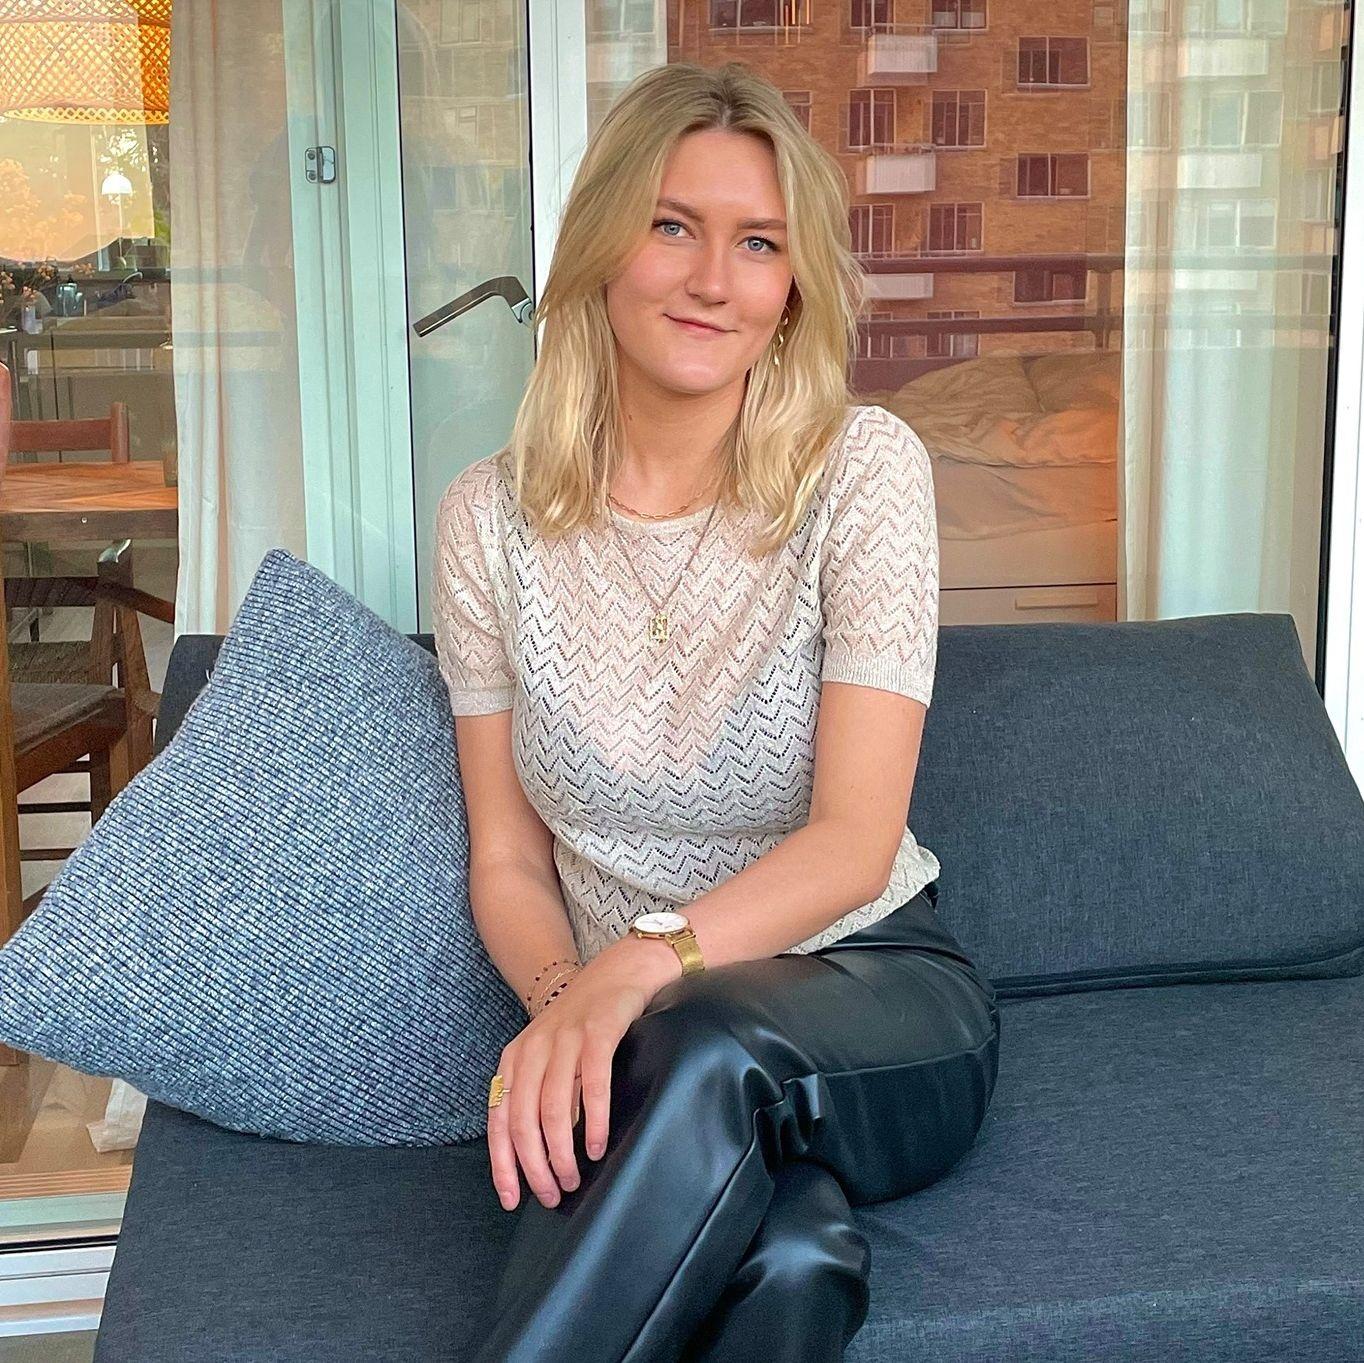 Melissa Badstue Brøgger